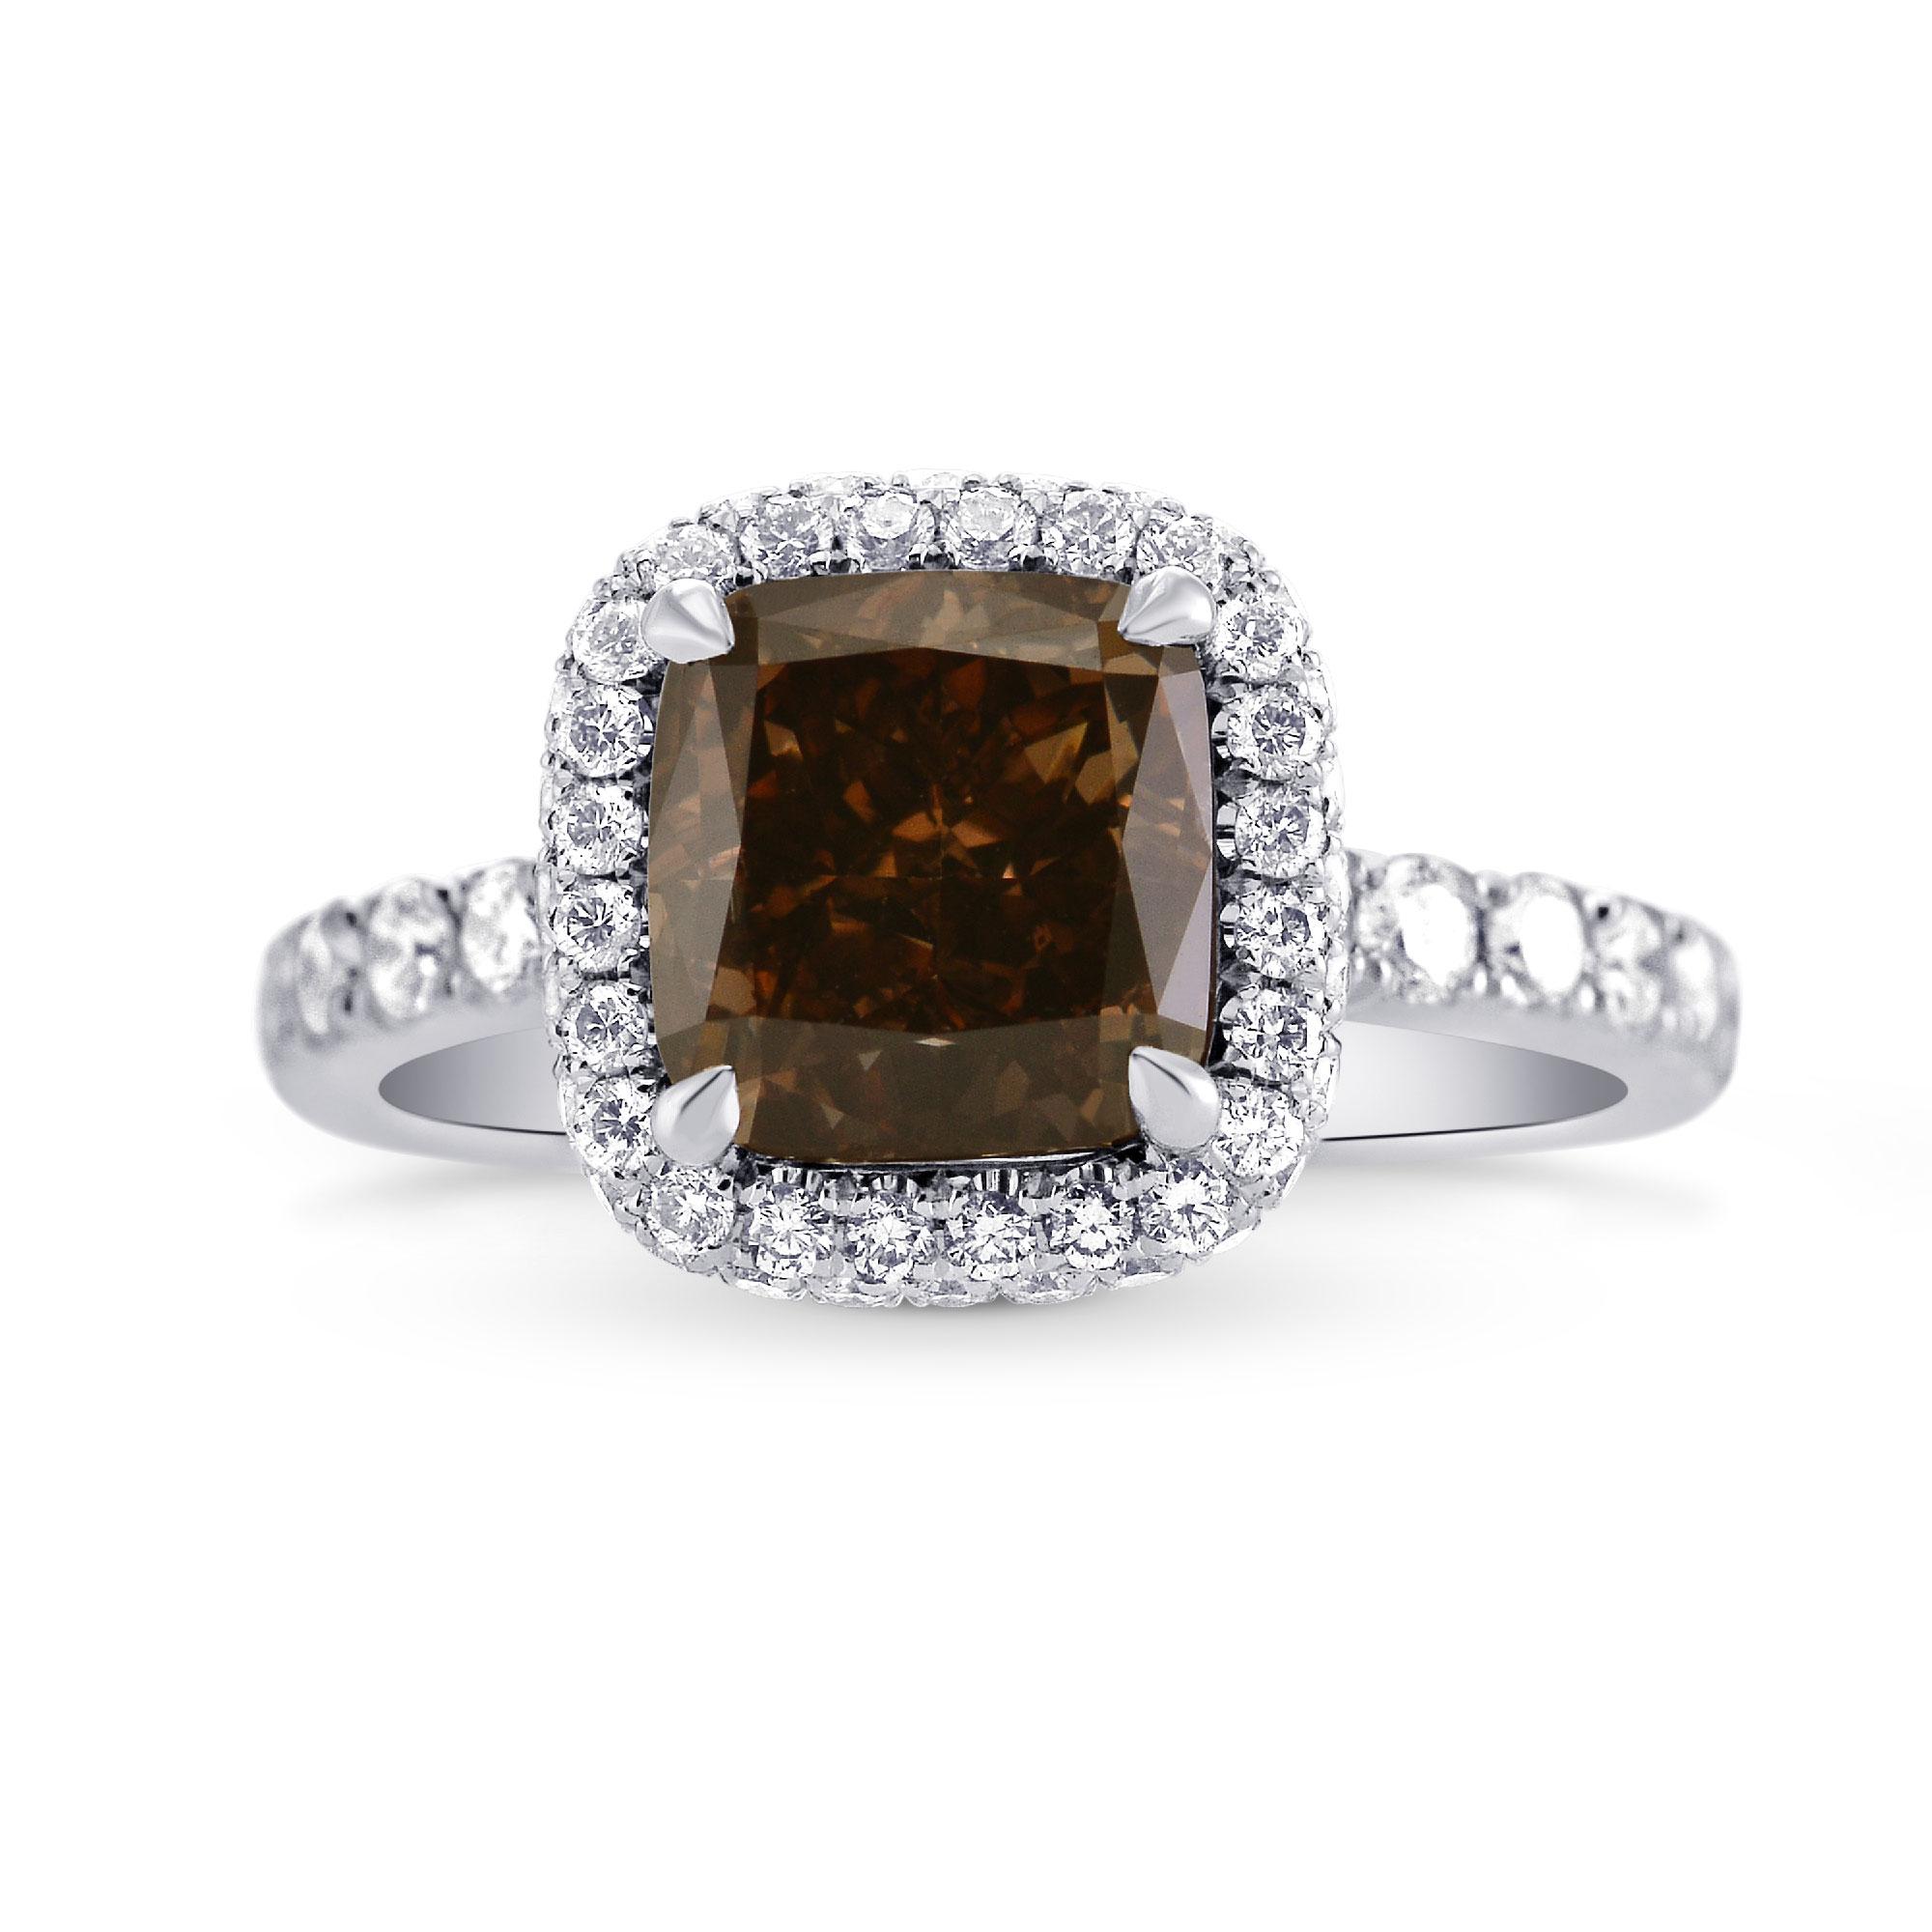 Fancy Dark Orangy Brown Cushion Diamond Halo Ring, SKU 280008 (3.28Ct TW)